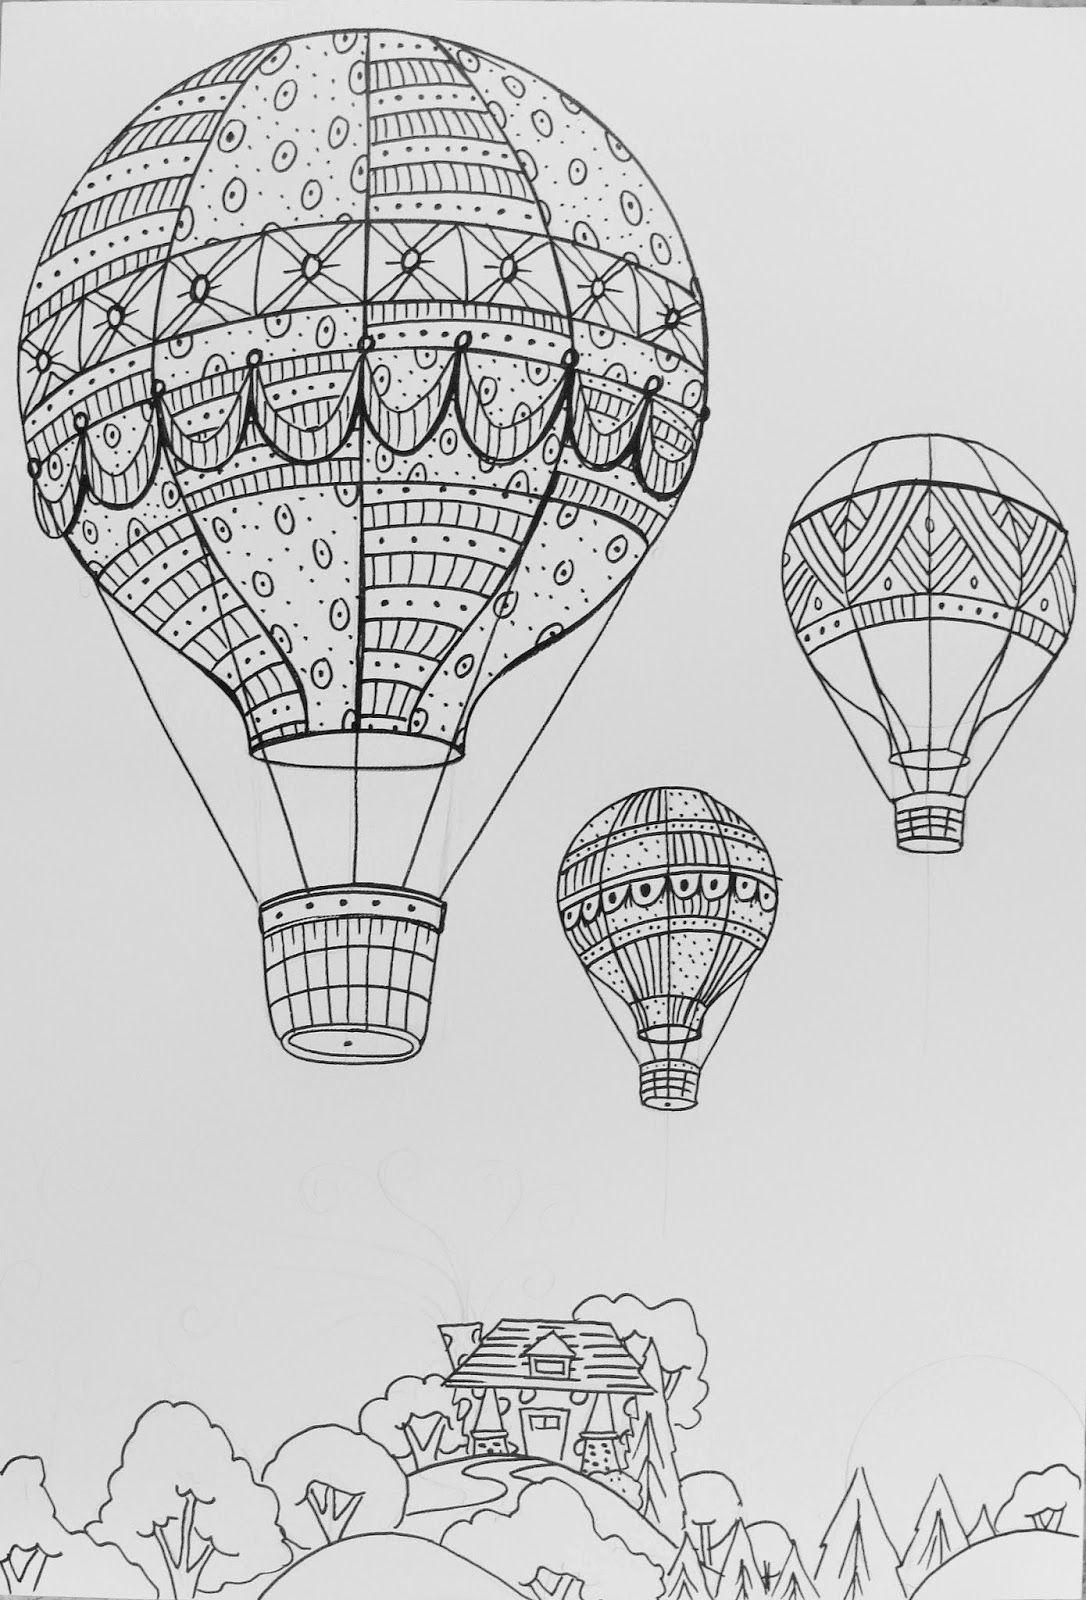 How To Draw A Hot Air Balloon Step By Luchtballon Tattoo Luchtballon Mandala Kleurplaten